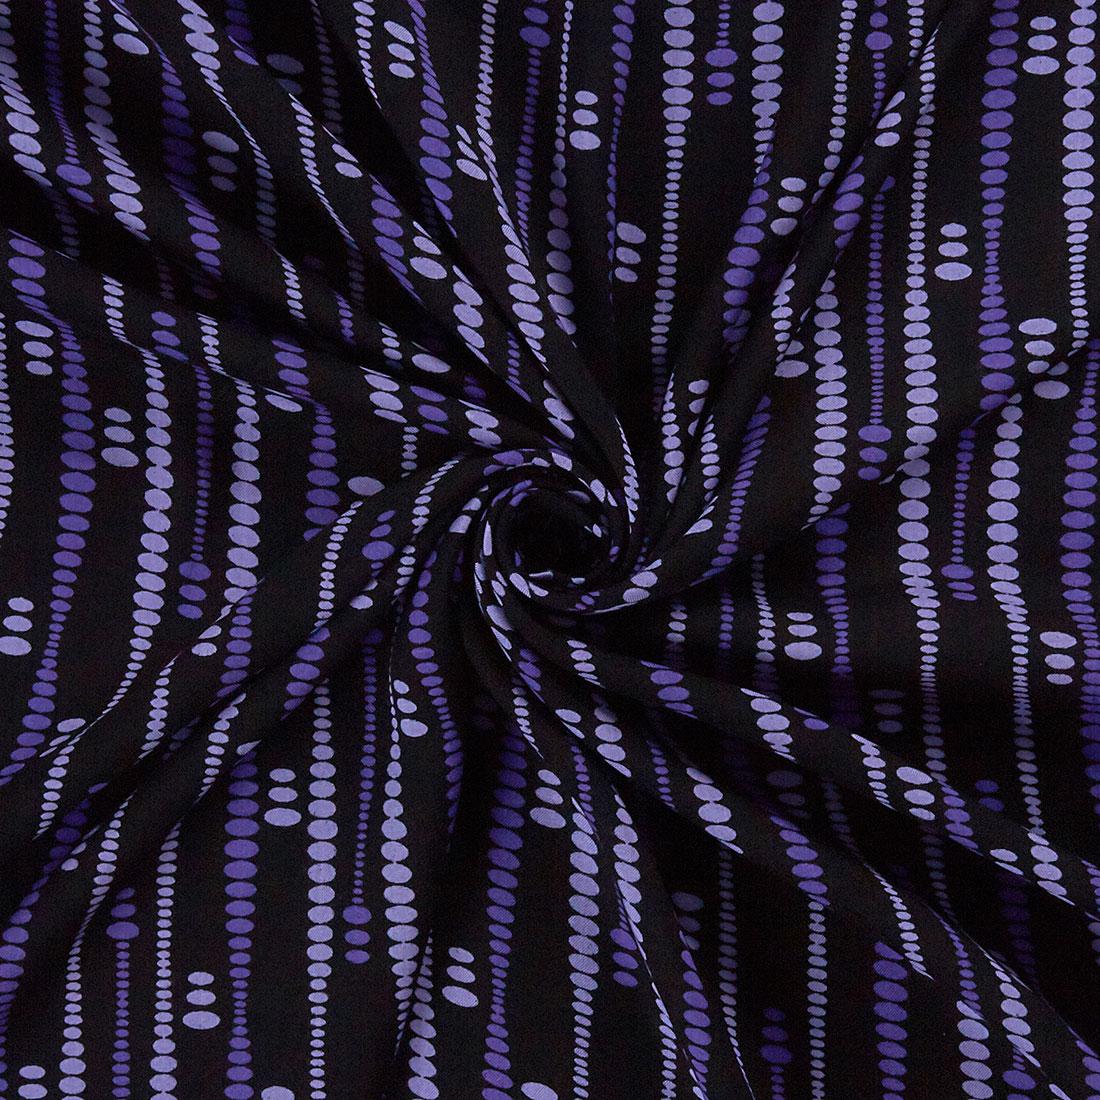 Abstract Dot Print Purple